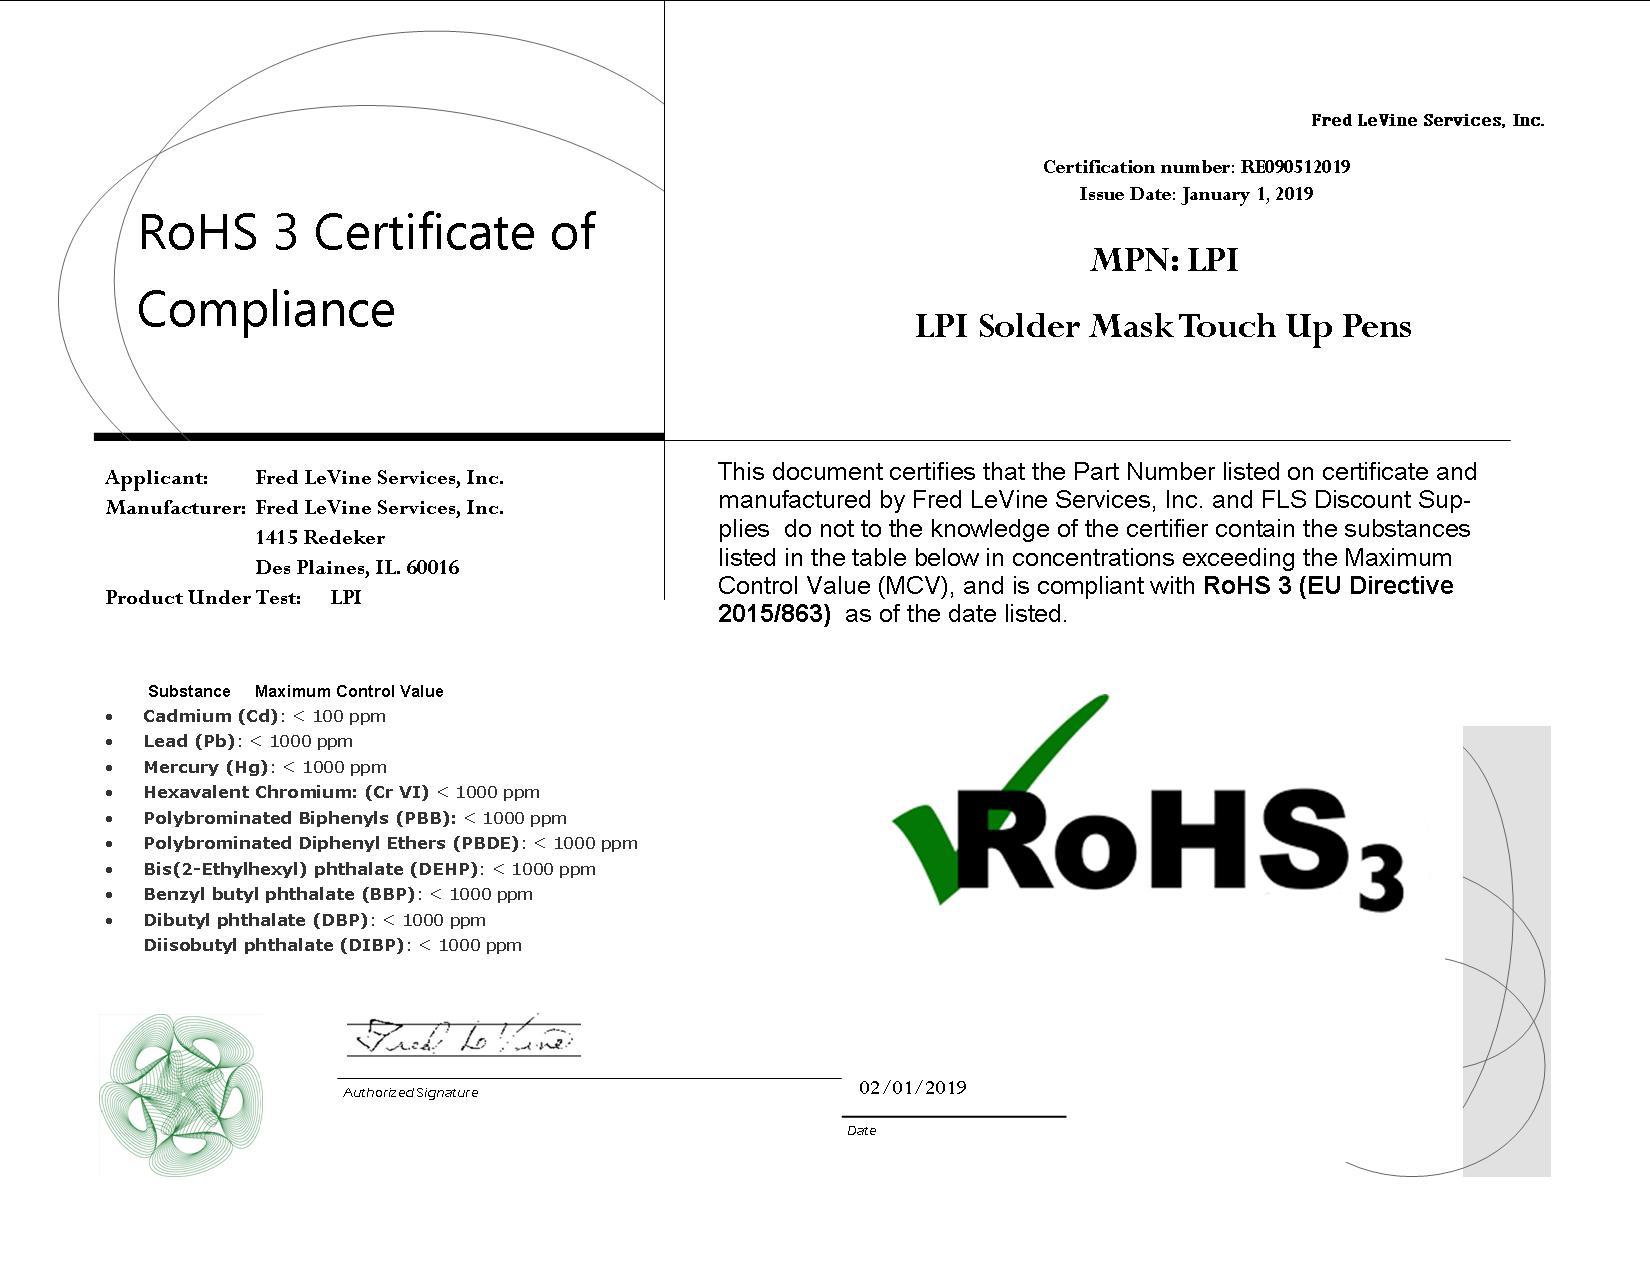 rohs-3-2019-certification-for-lpi.jpg